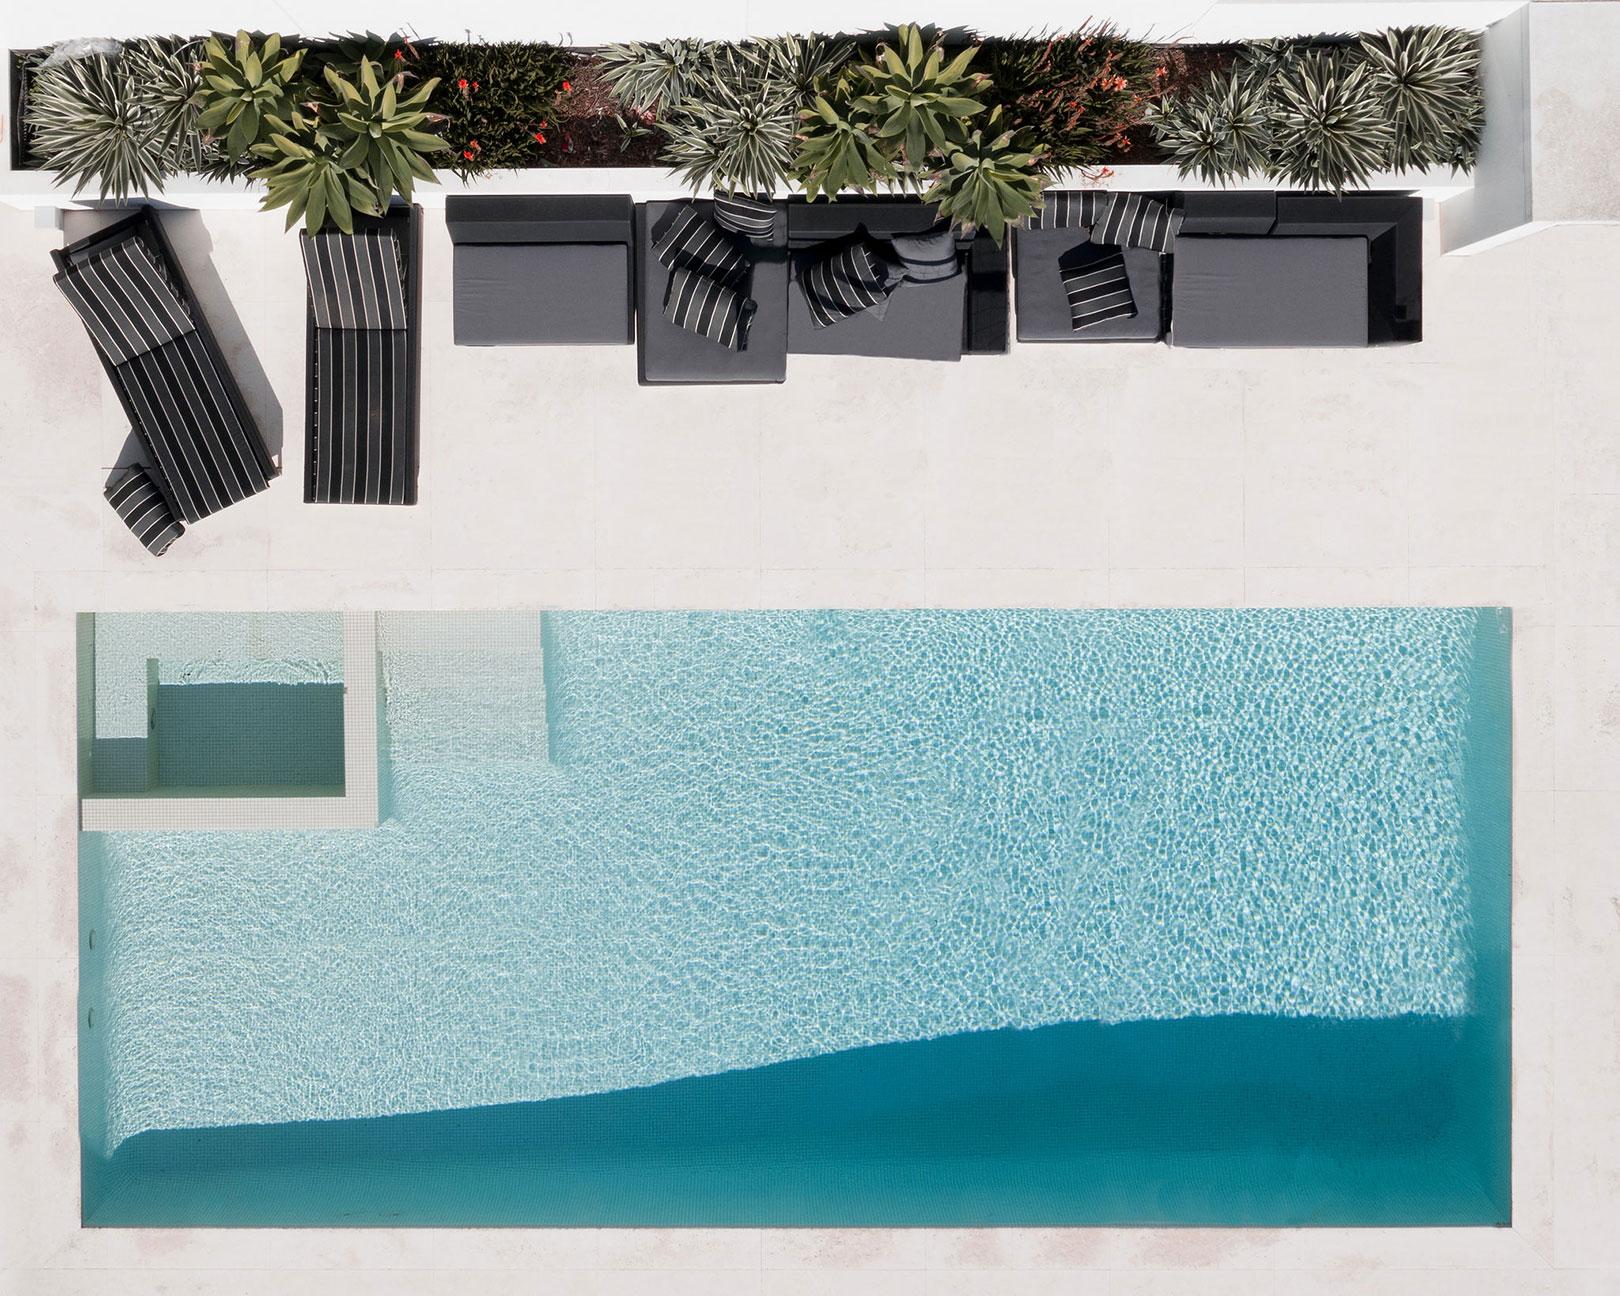 Private Pool Sydney #1